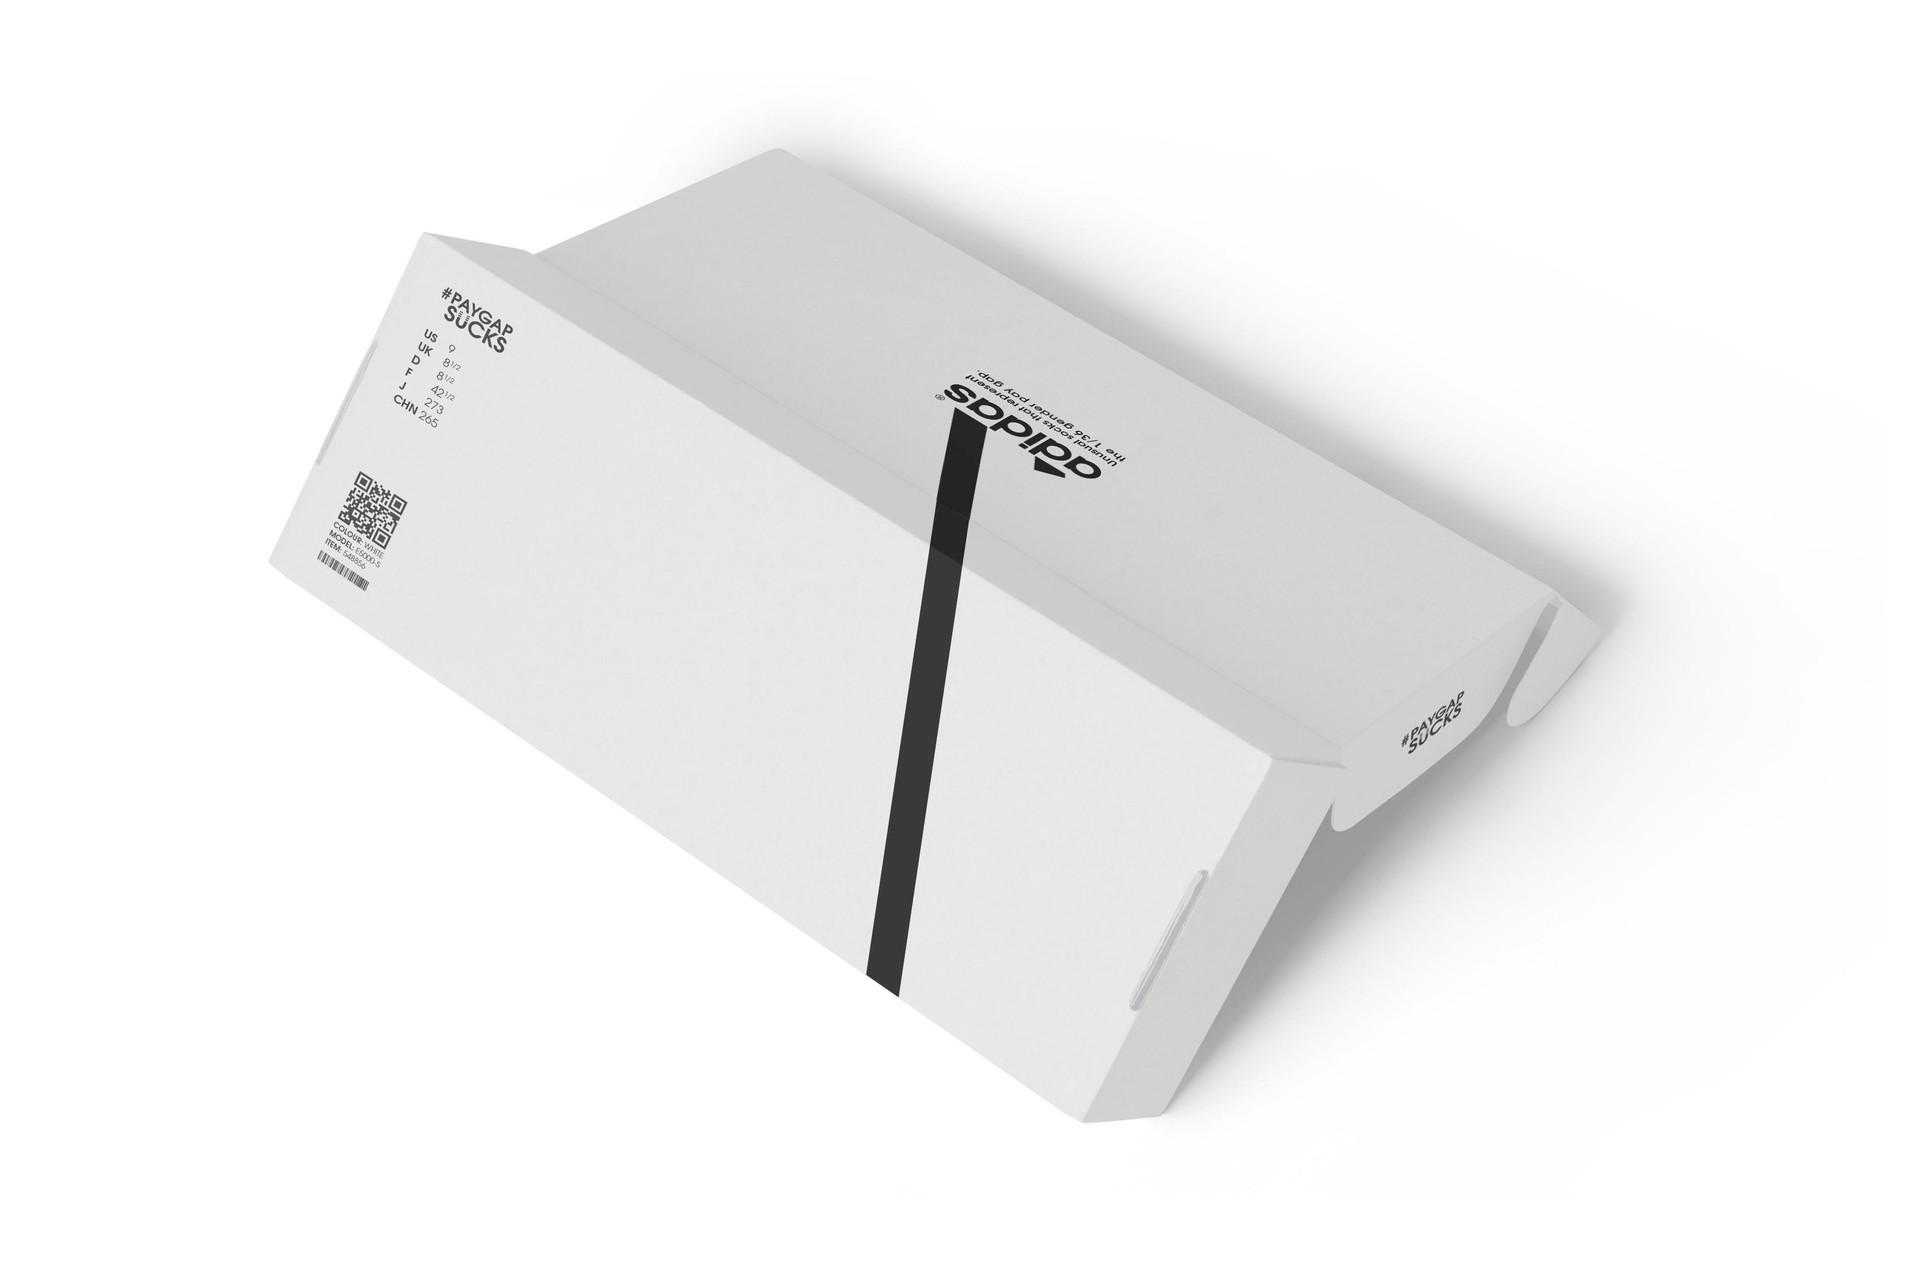 packaging back